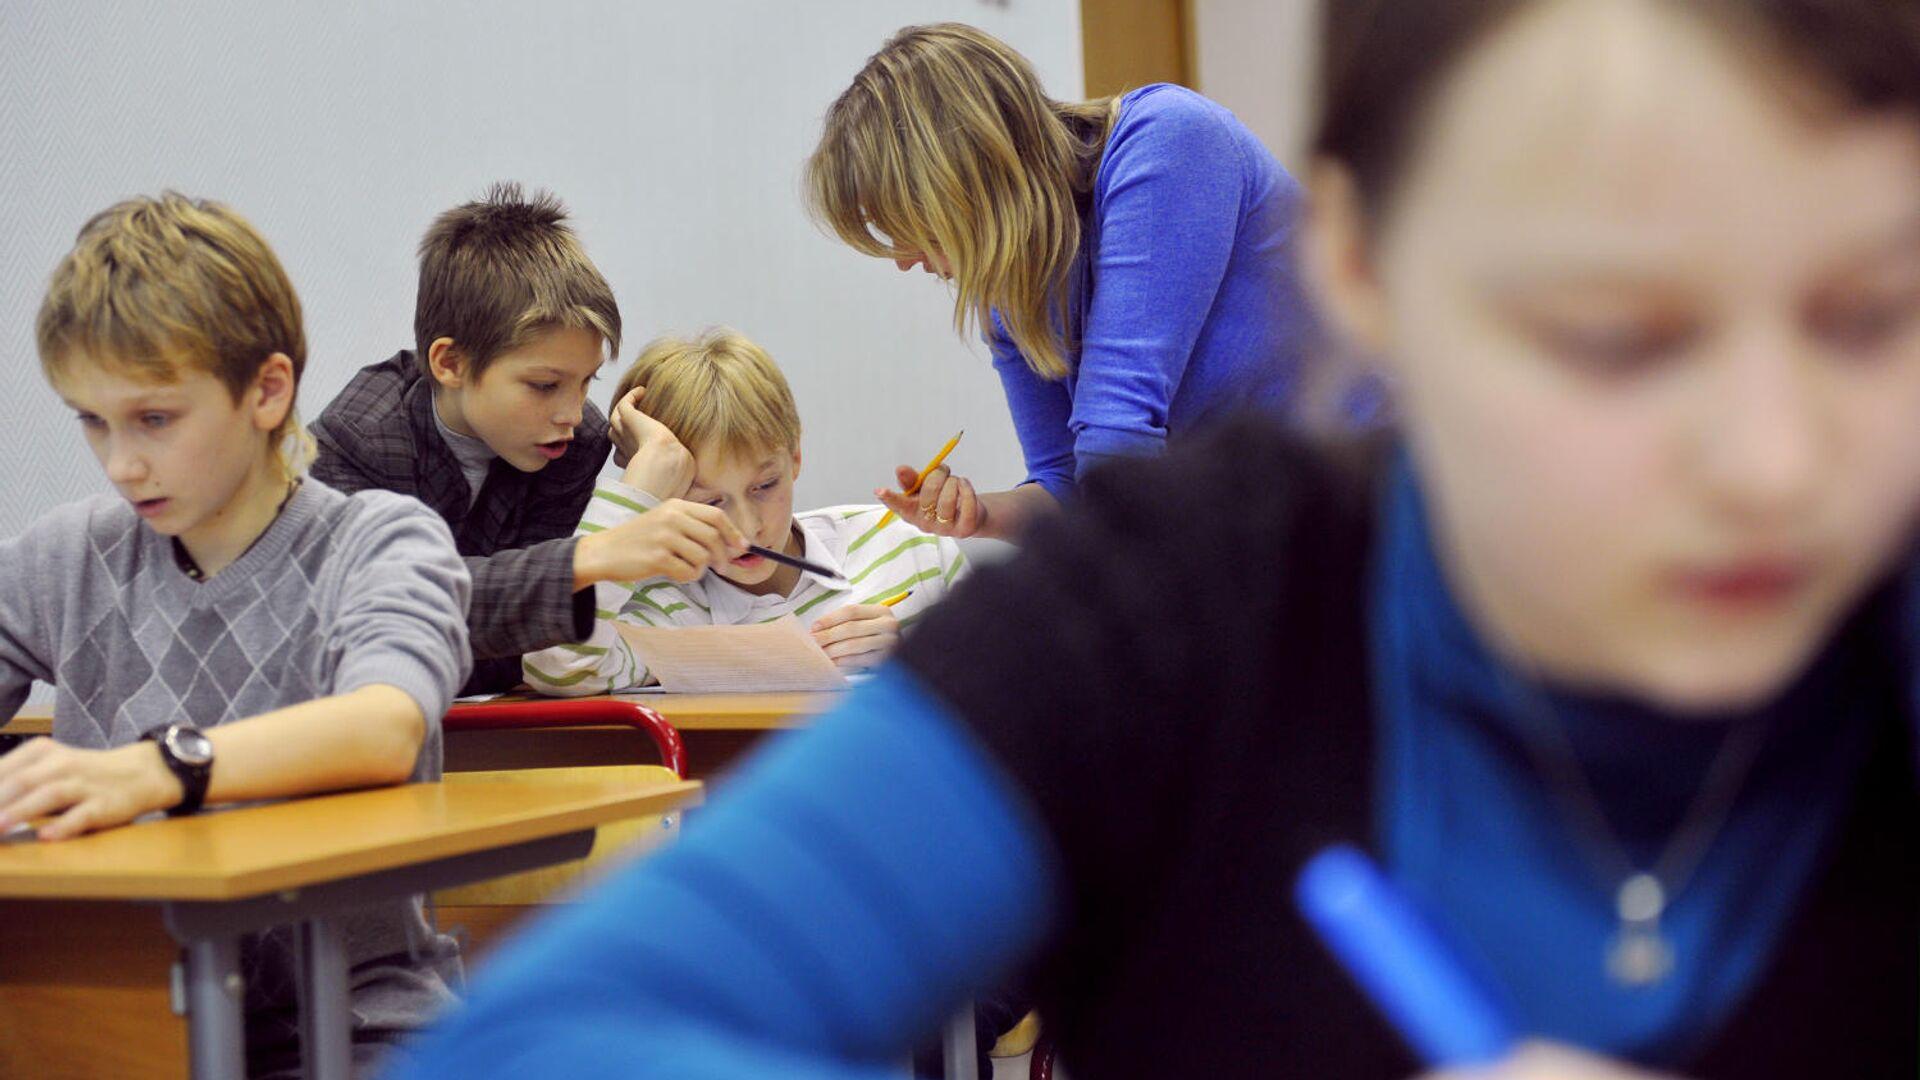 Ученики во время занятия - РИА Новости, 1920, 22.01.2021